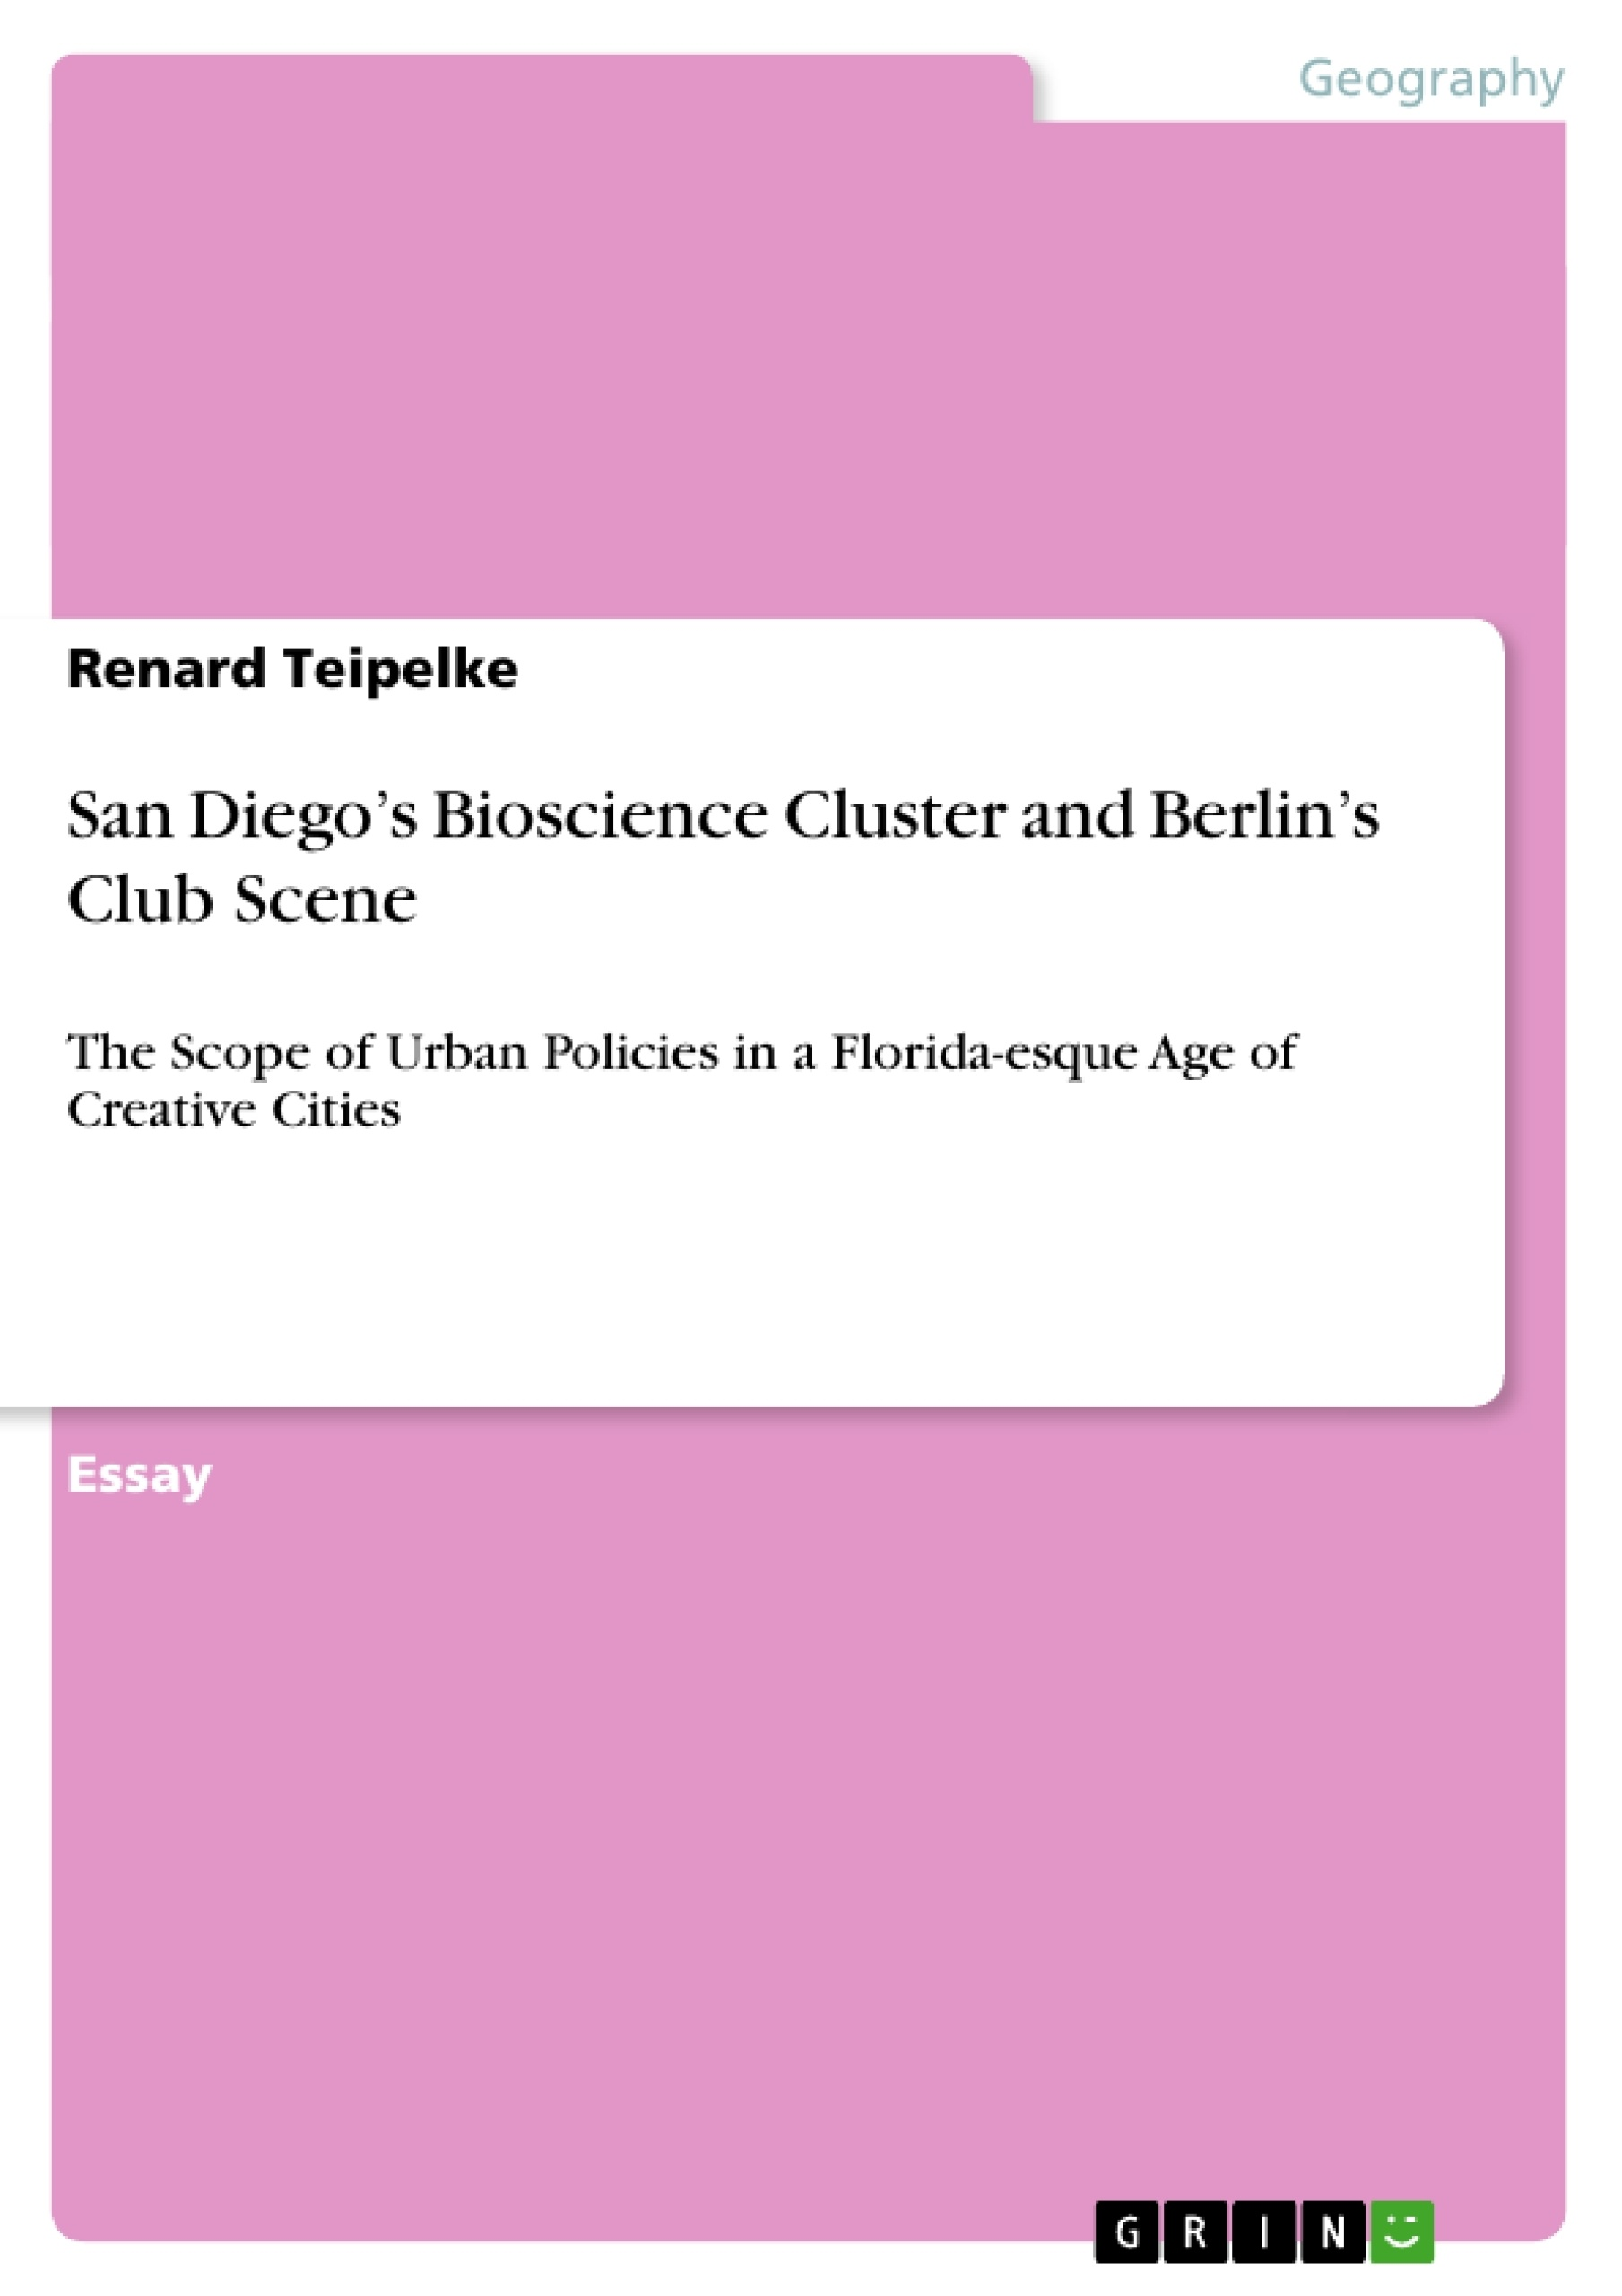 Title: San Diego's Bioscience Cluster and Berlin's Club Scene